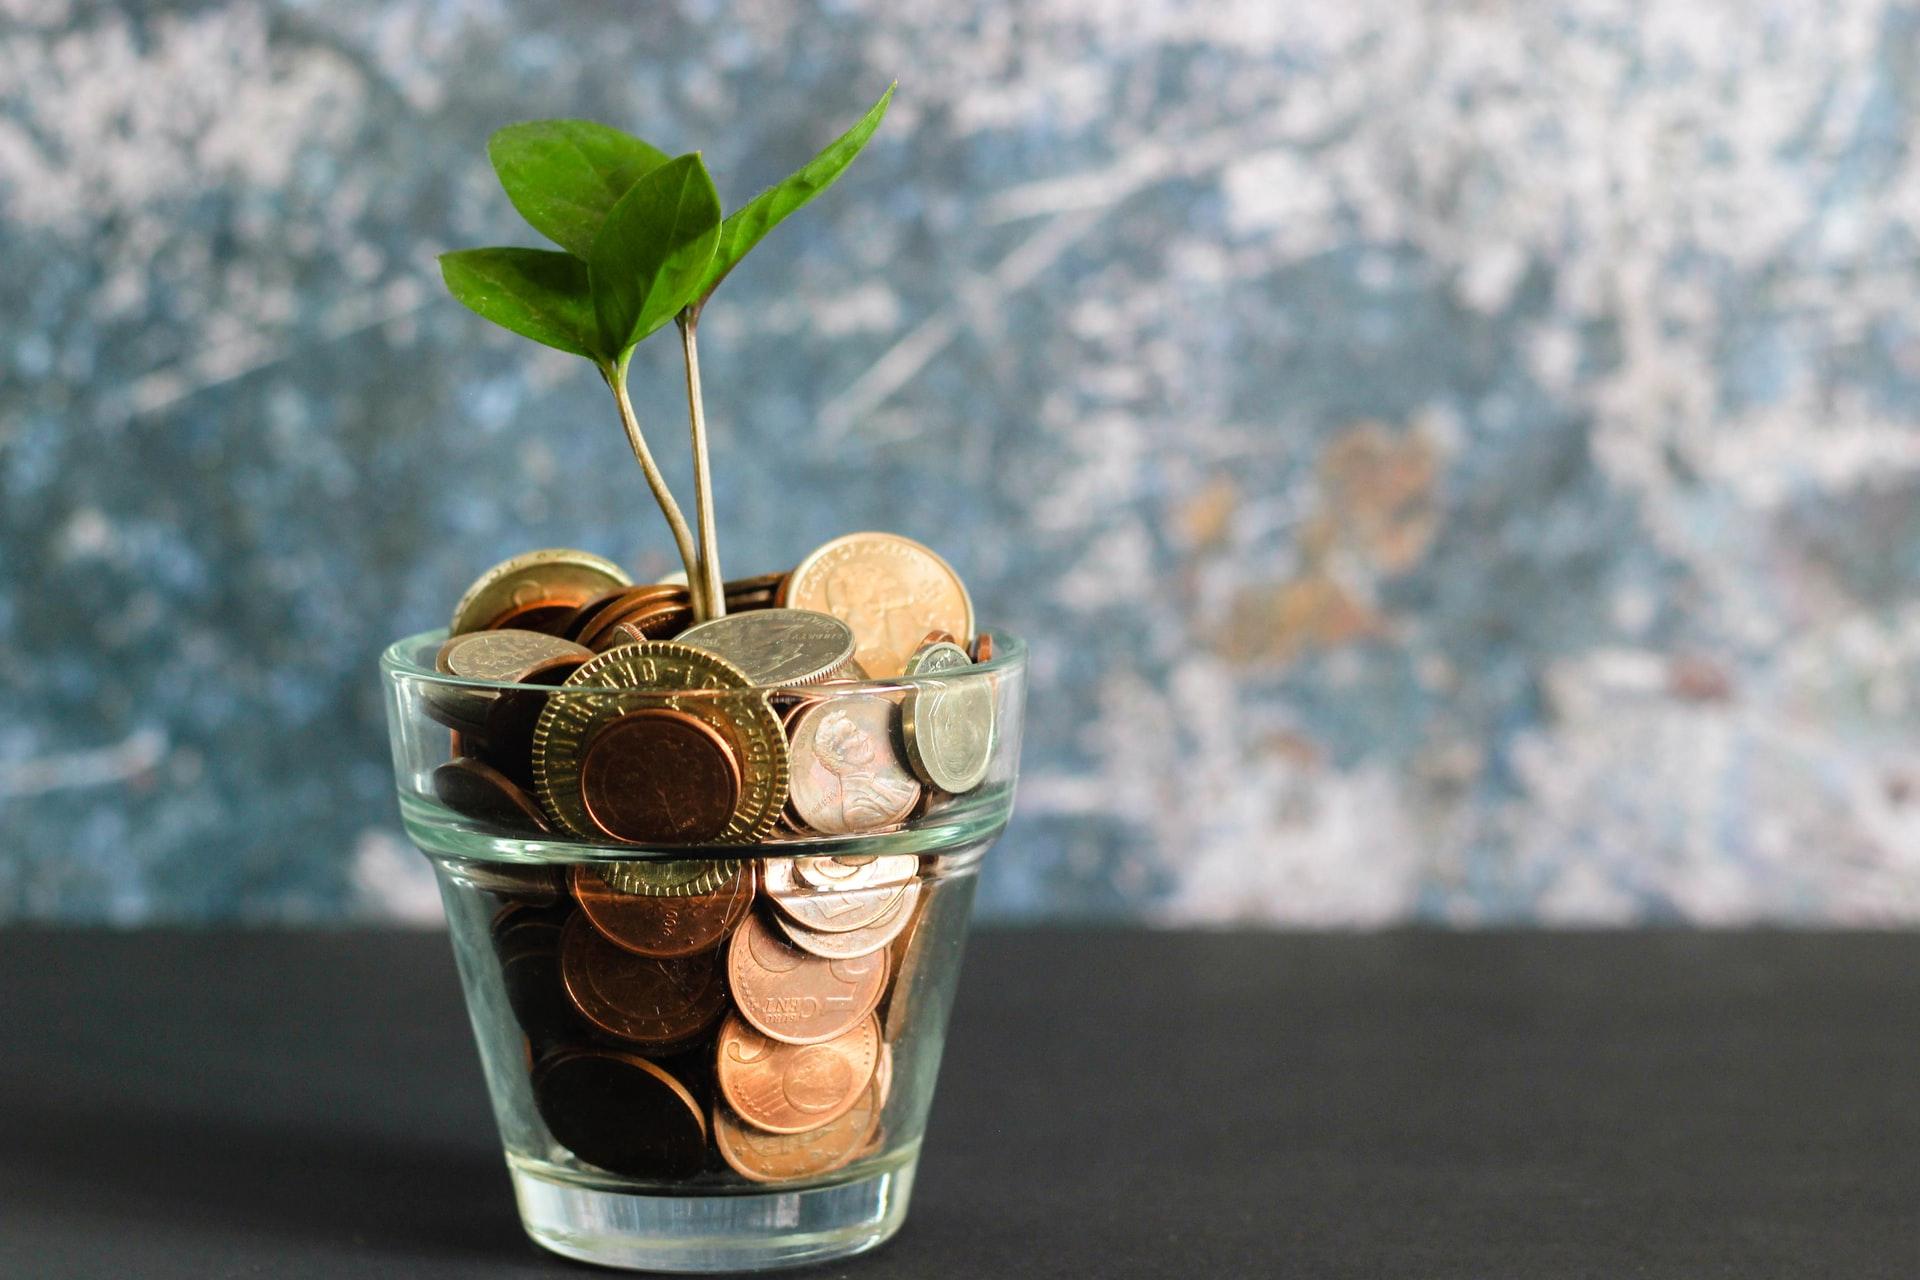 3 gode råd til hvordan du nemt kan spare penge i hverdagen